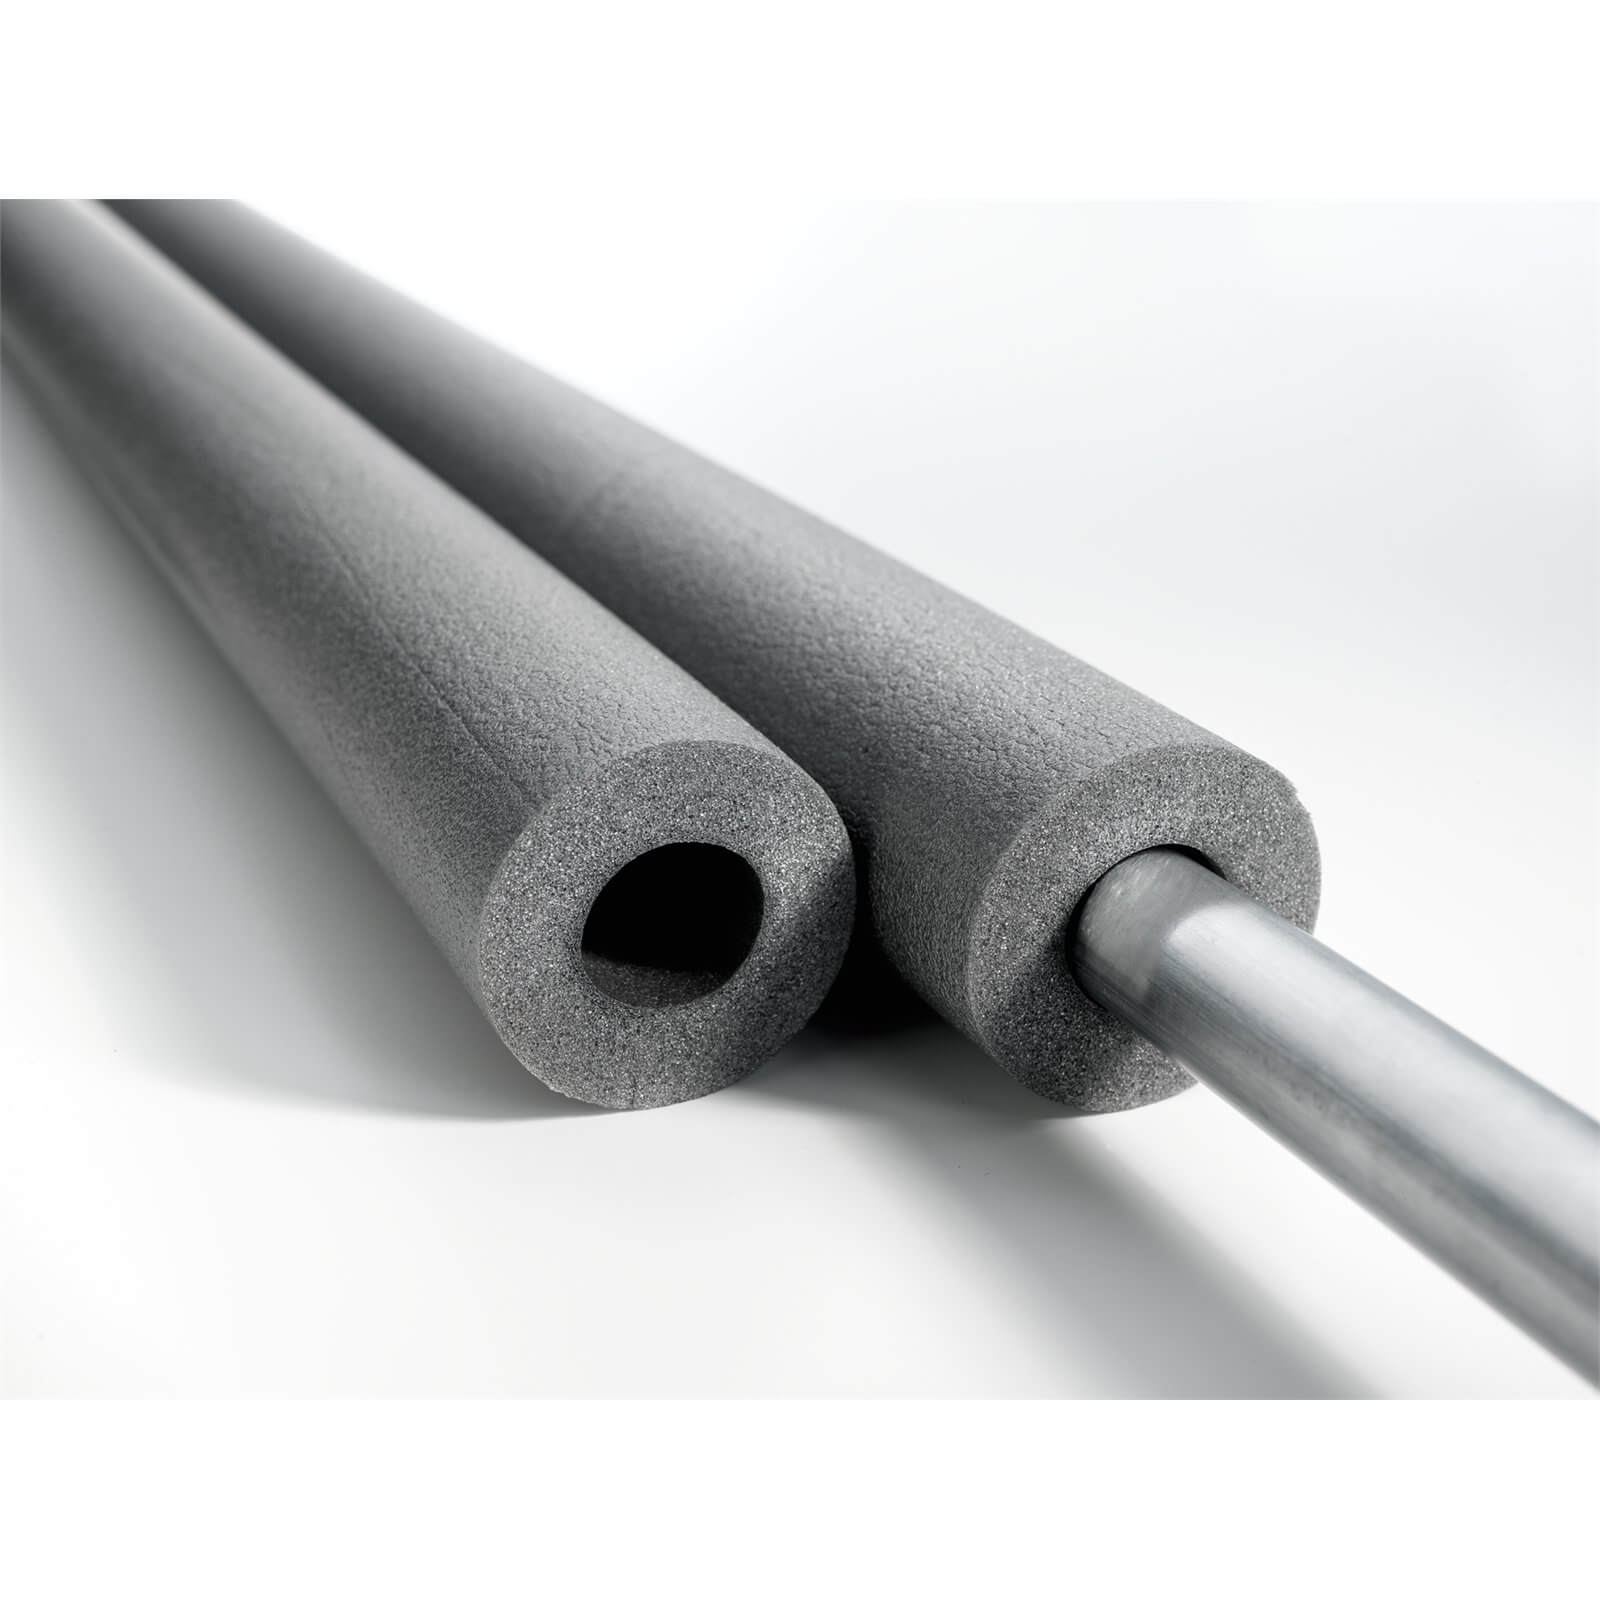 Climaflex 13mm Polyethylene Pipe Insulation - 22mm x 1m